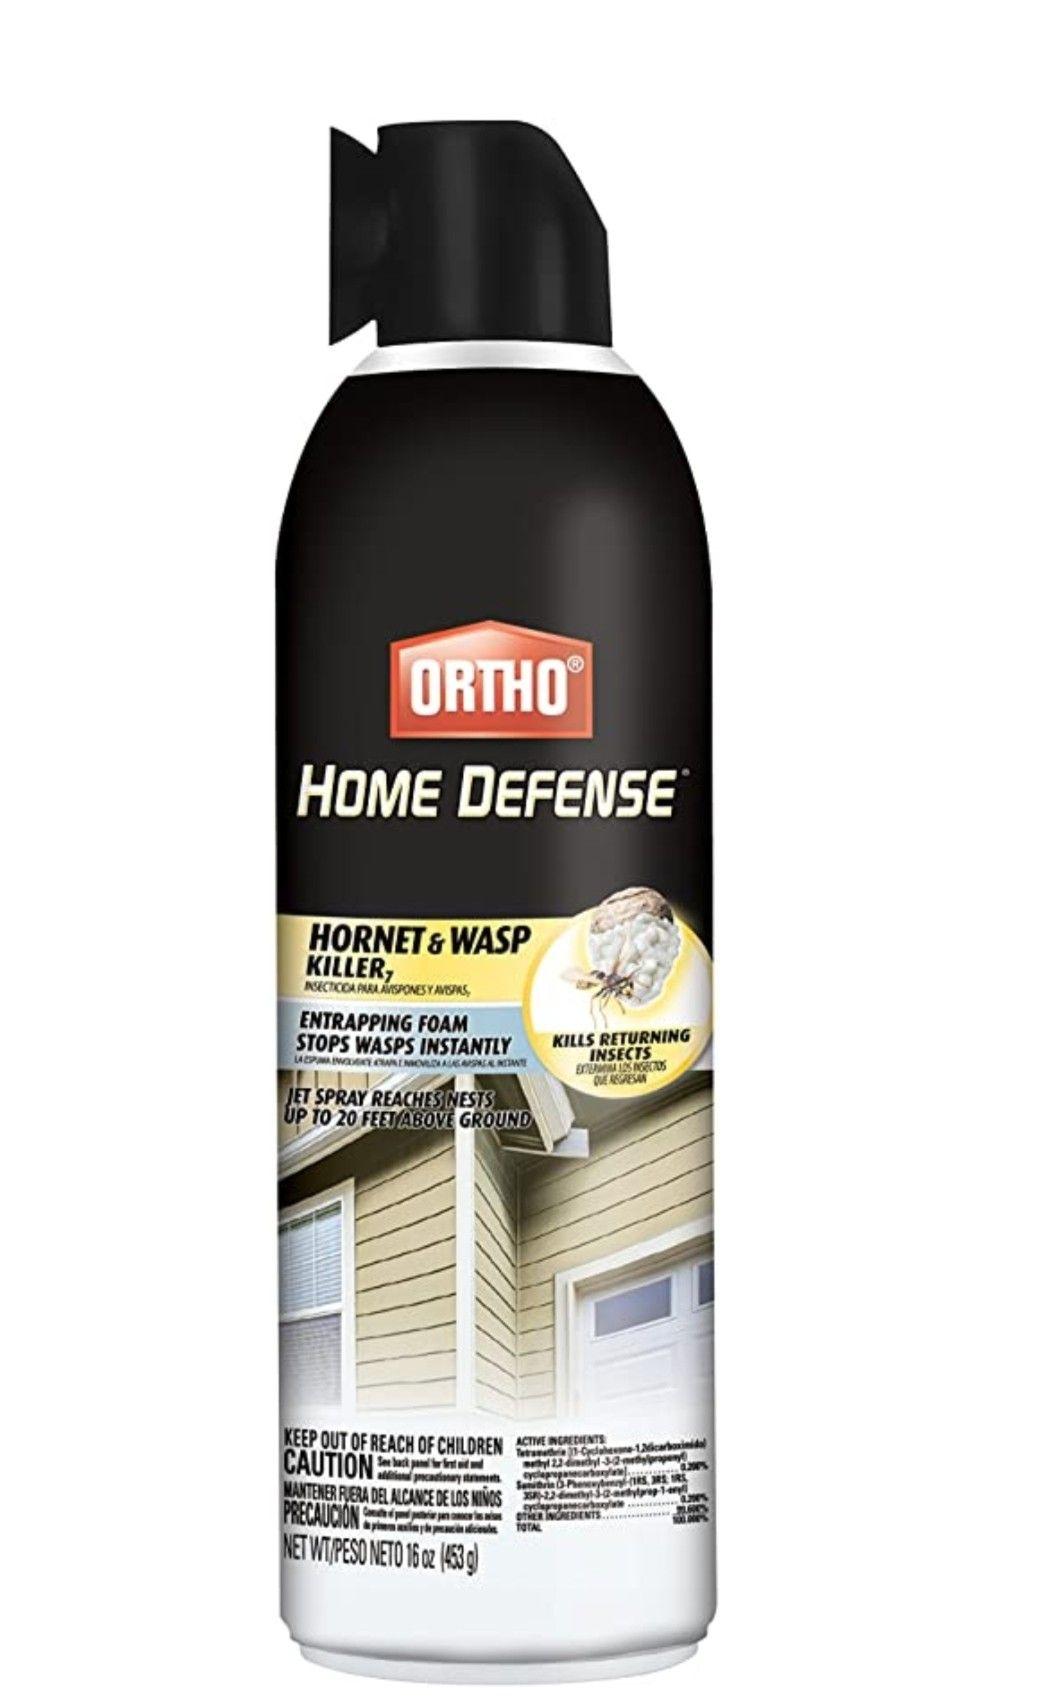 Ortho Home Defense & Wasp Killer7, 16 Oz in 2020